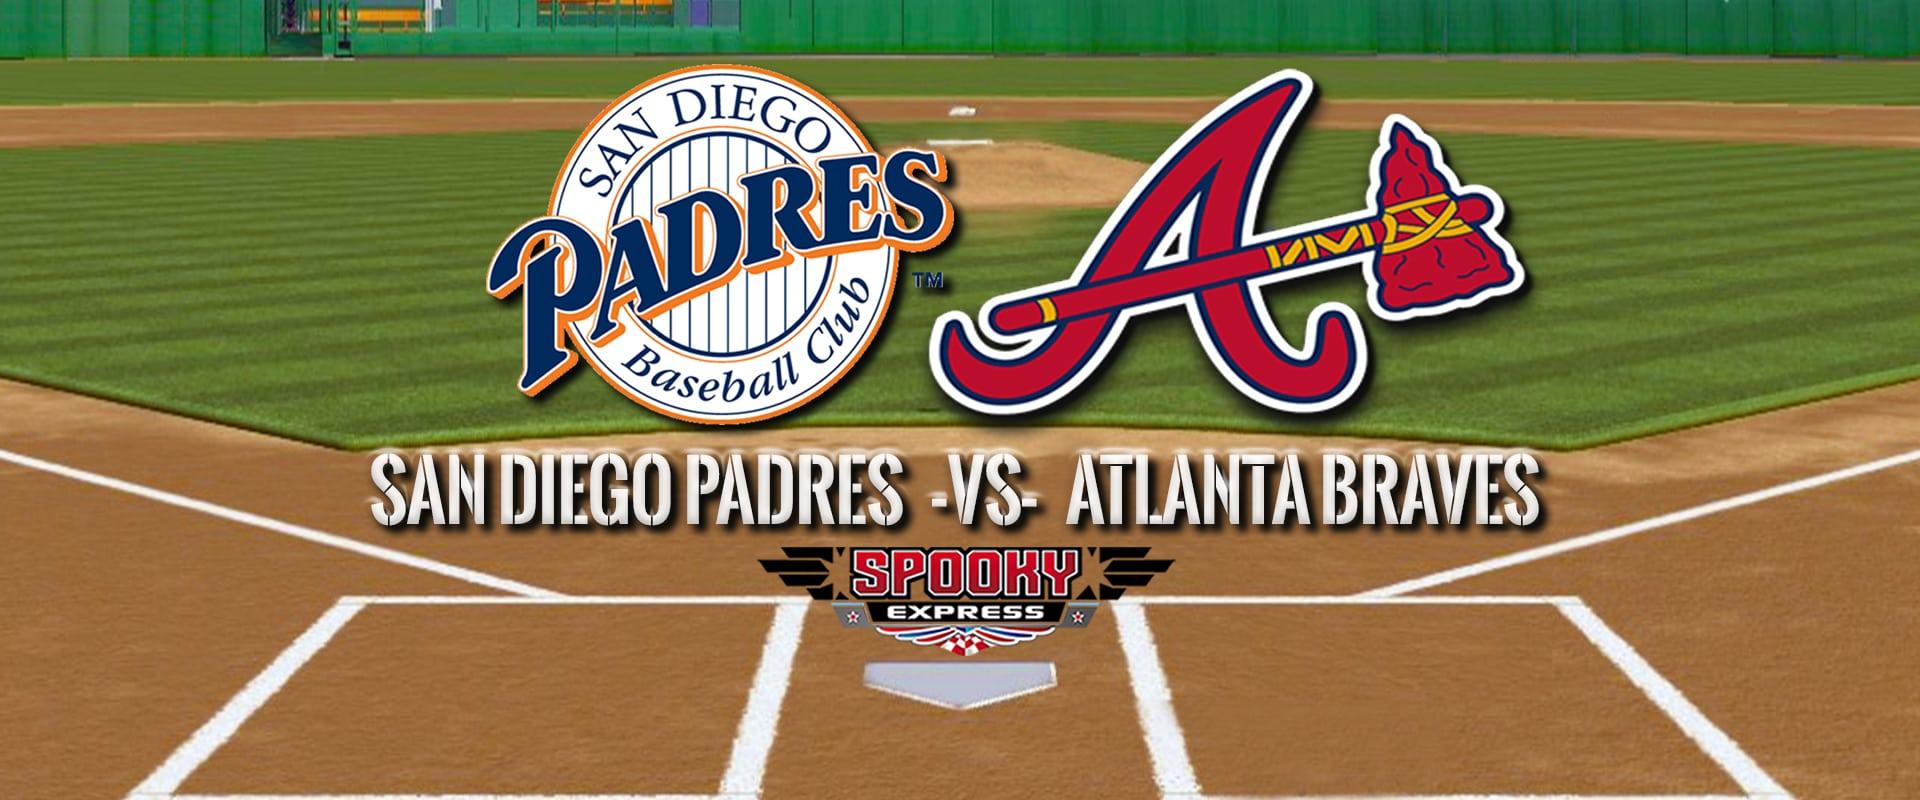 MLB Betting Preview: Atlanta Braves vs. San Diego Padres